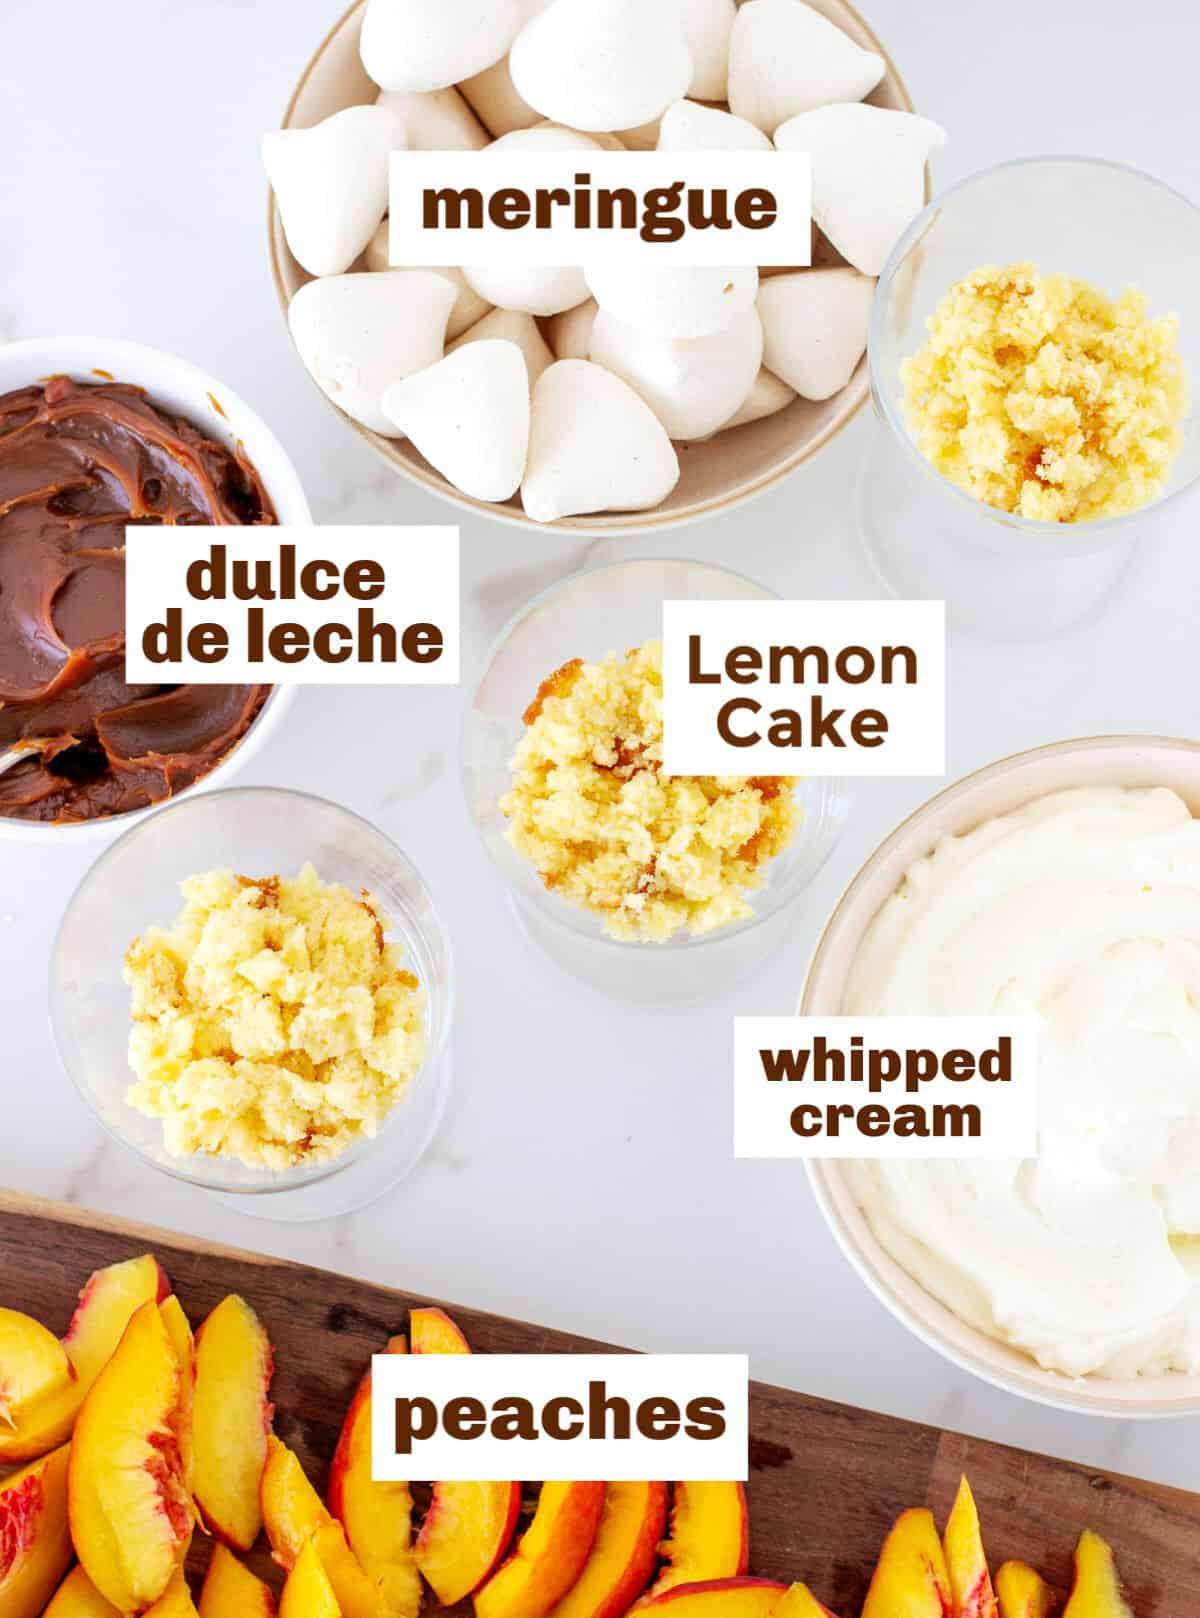 Peaches, cake, cream, meringue and dulce de leche in bowls on white surface